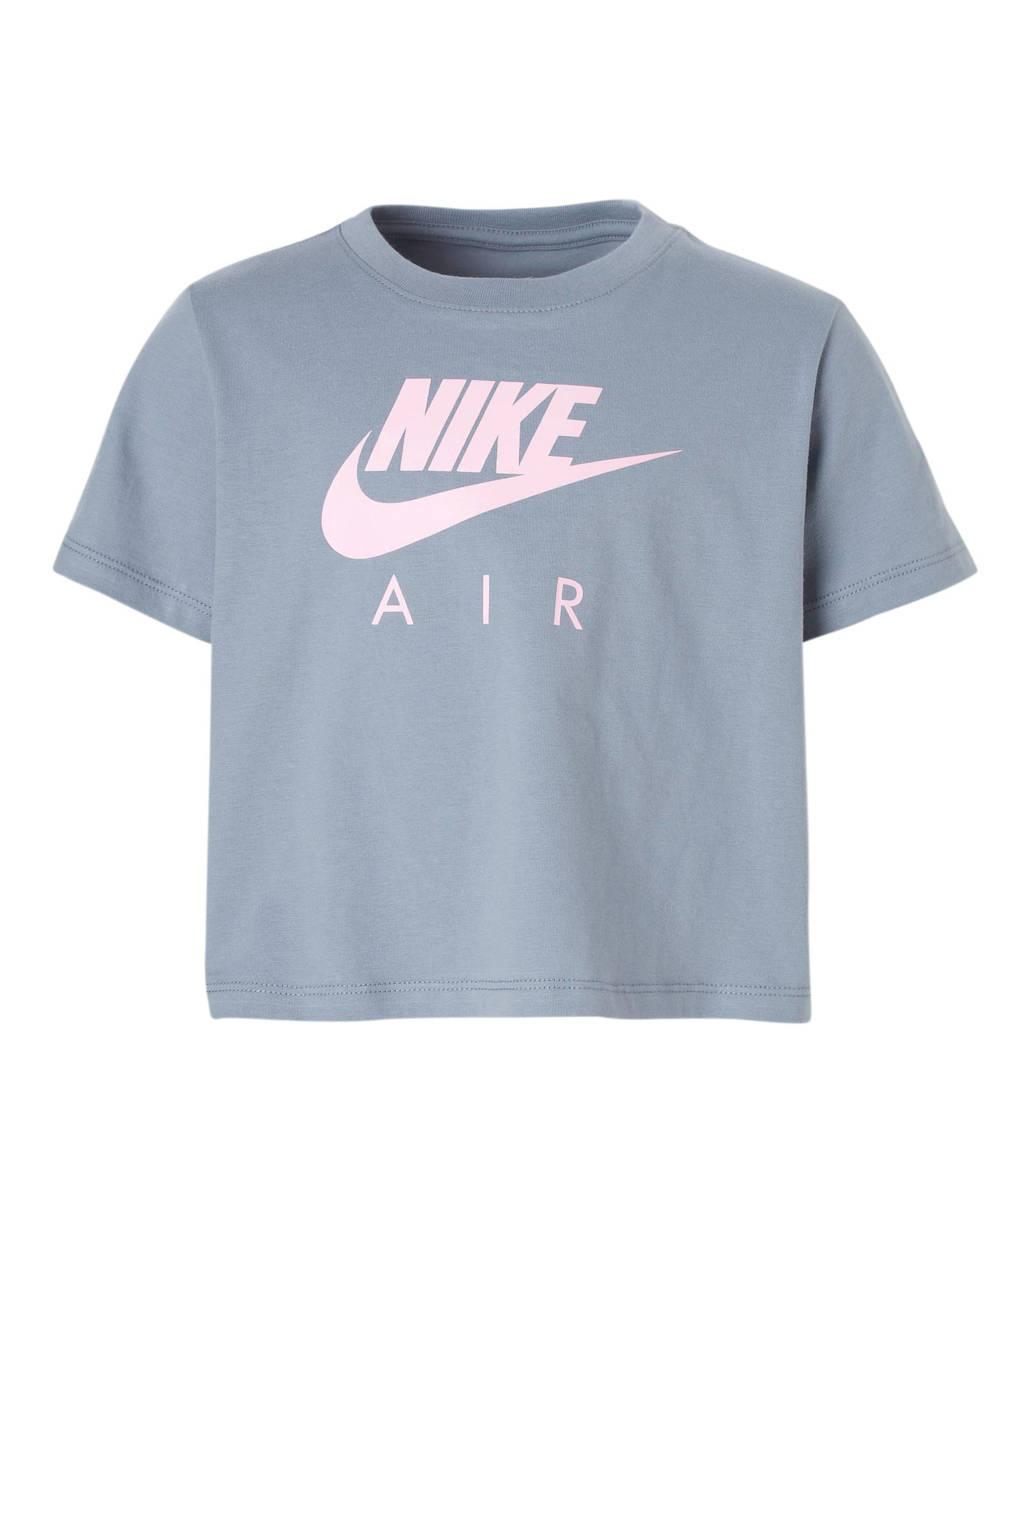 Nike T-shirt met printopdruk lichtblauw, Lichtblauw